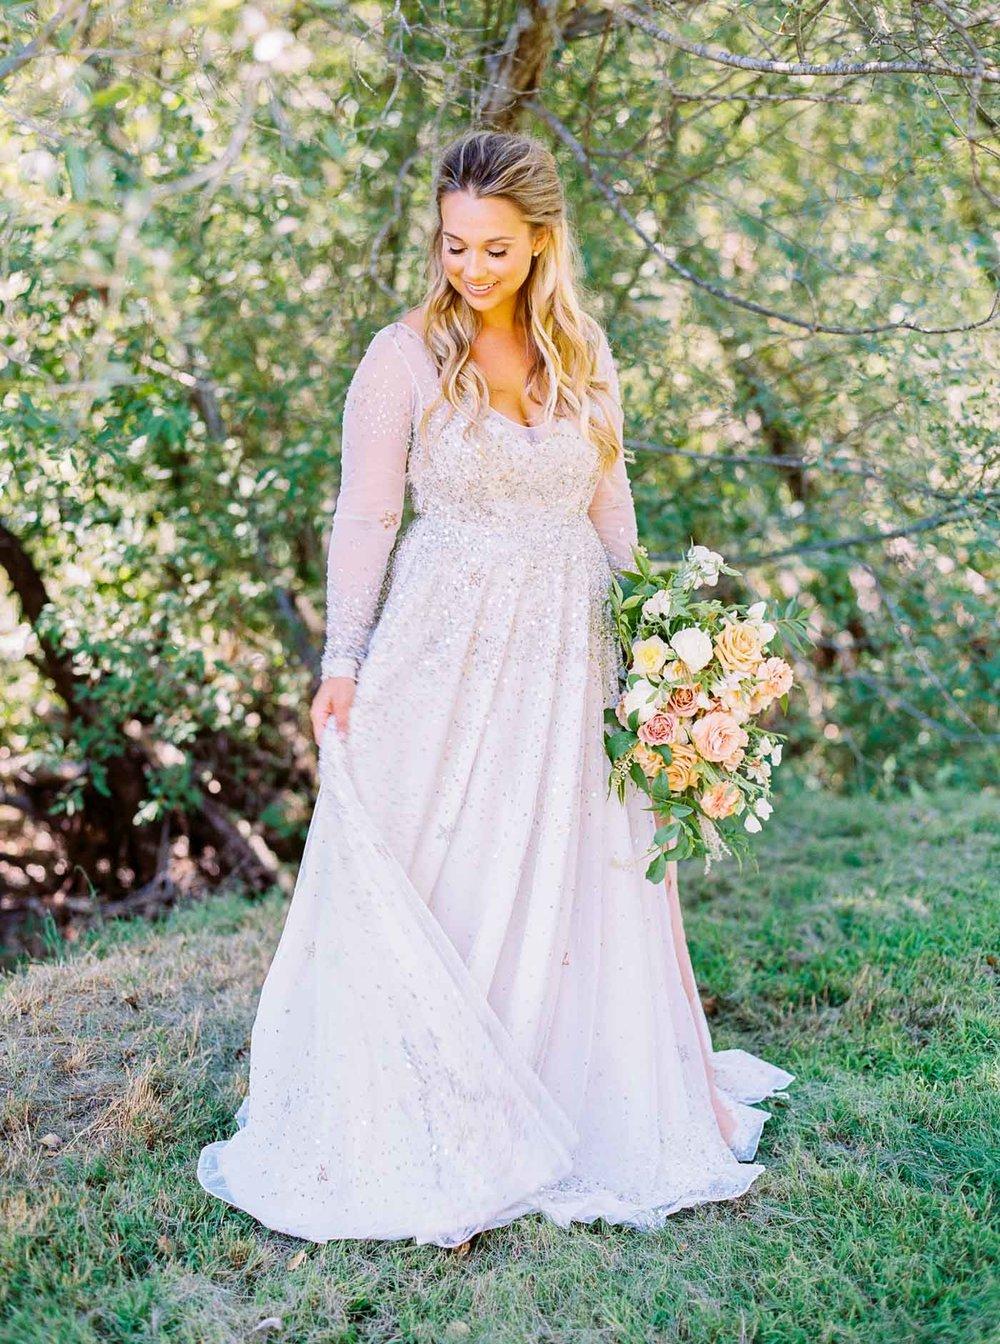 Gardener Ranch wedding-55.jpg